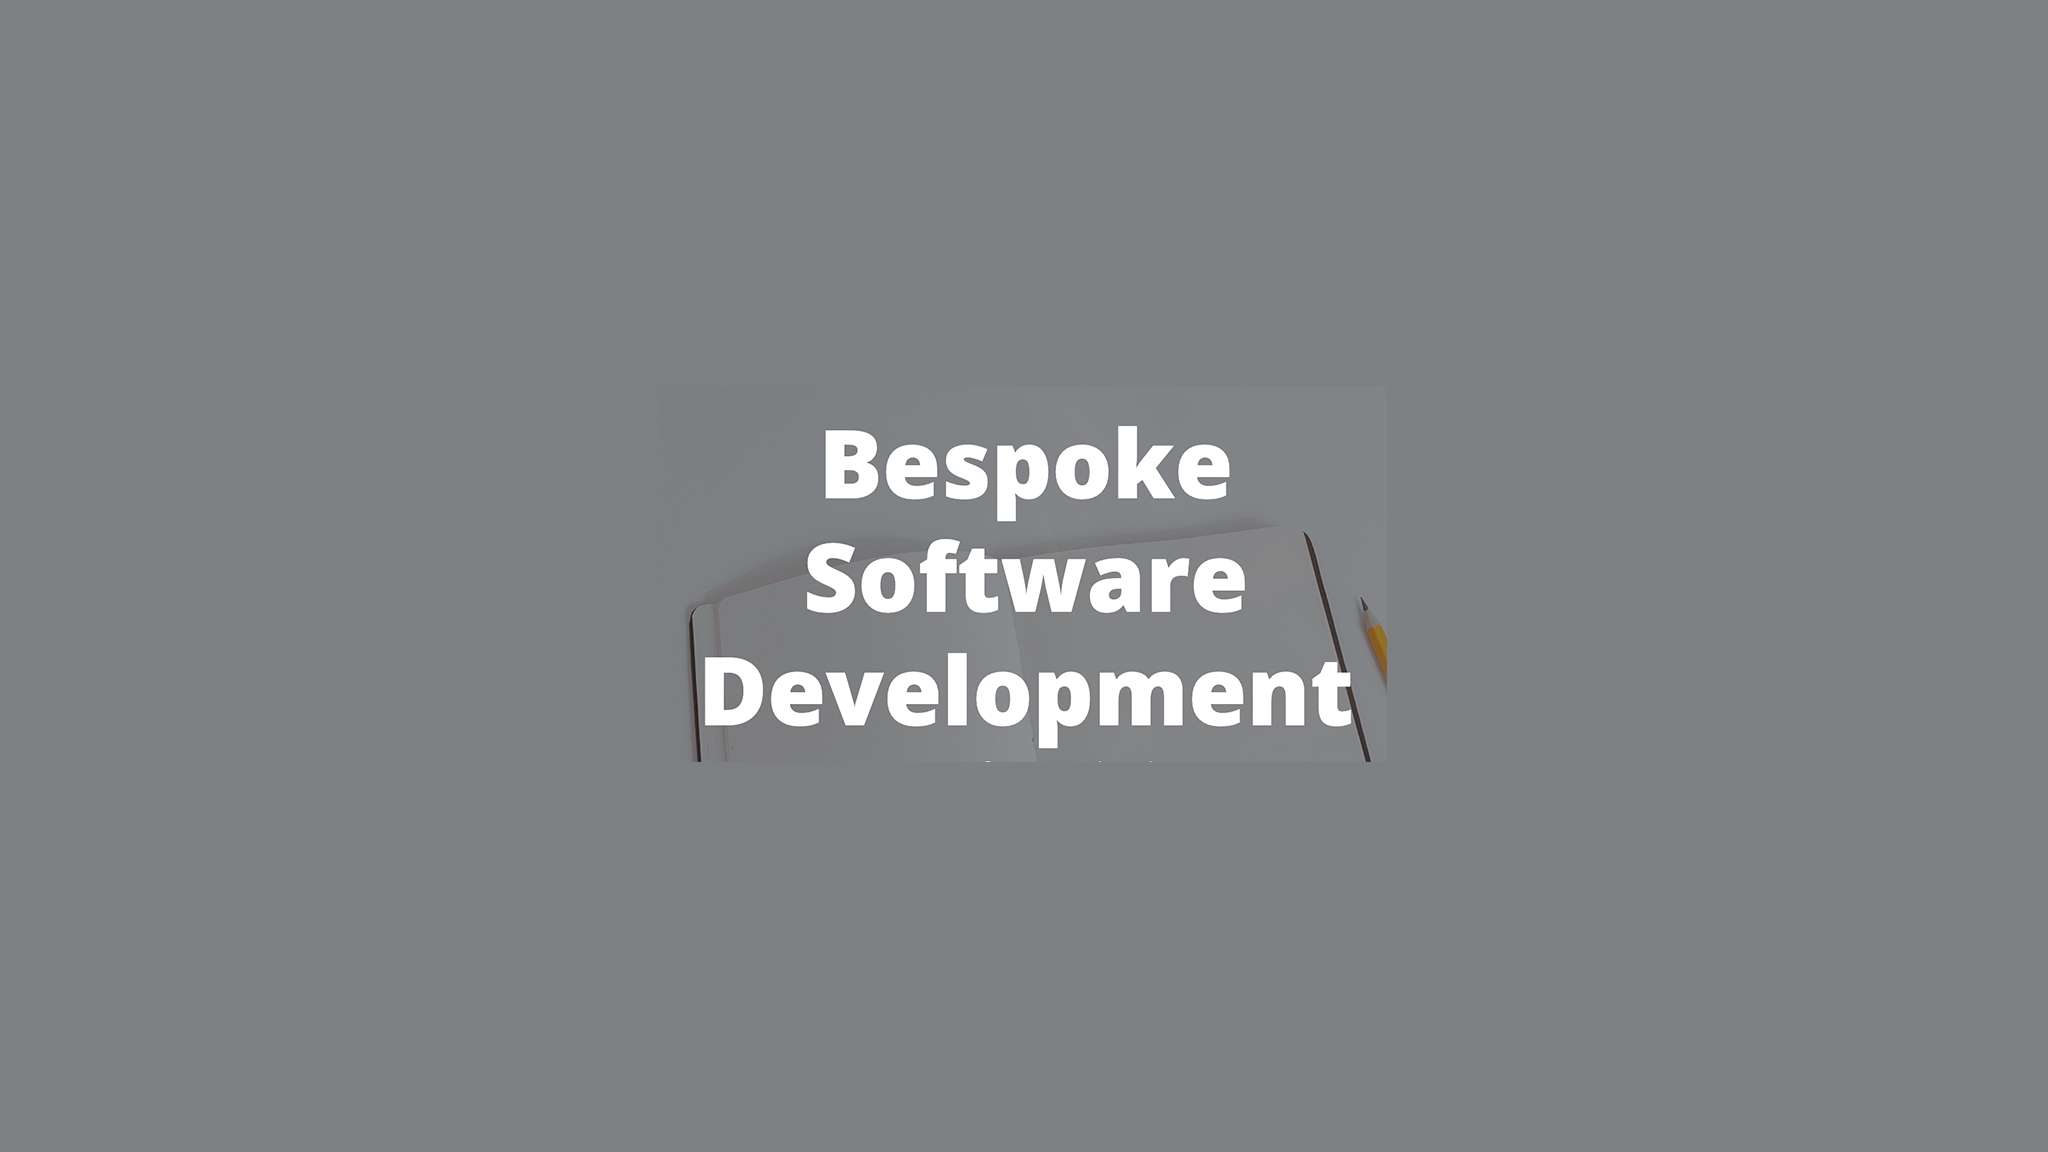 Bespoke Software Development (@bespokesoftwaredevelopment) Cover Image